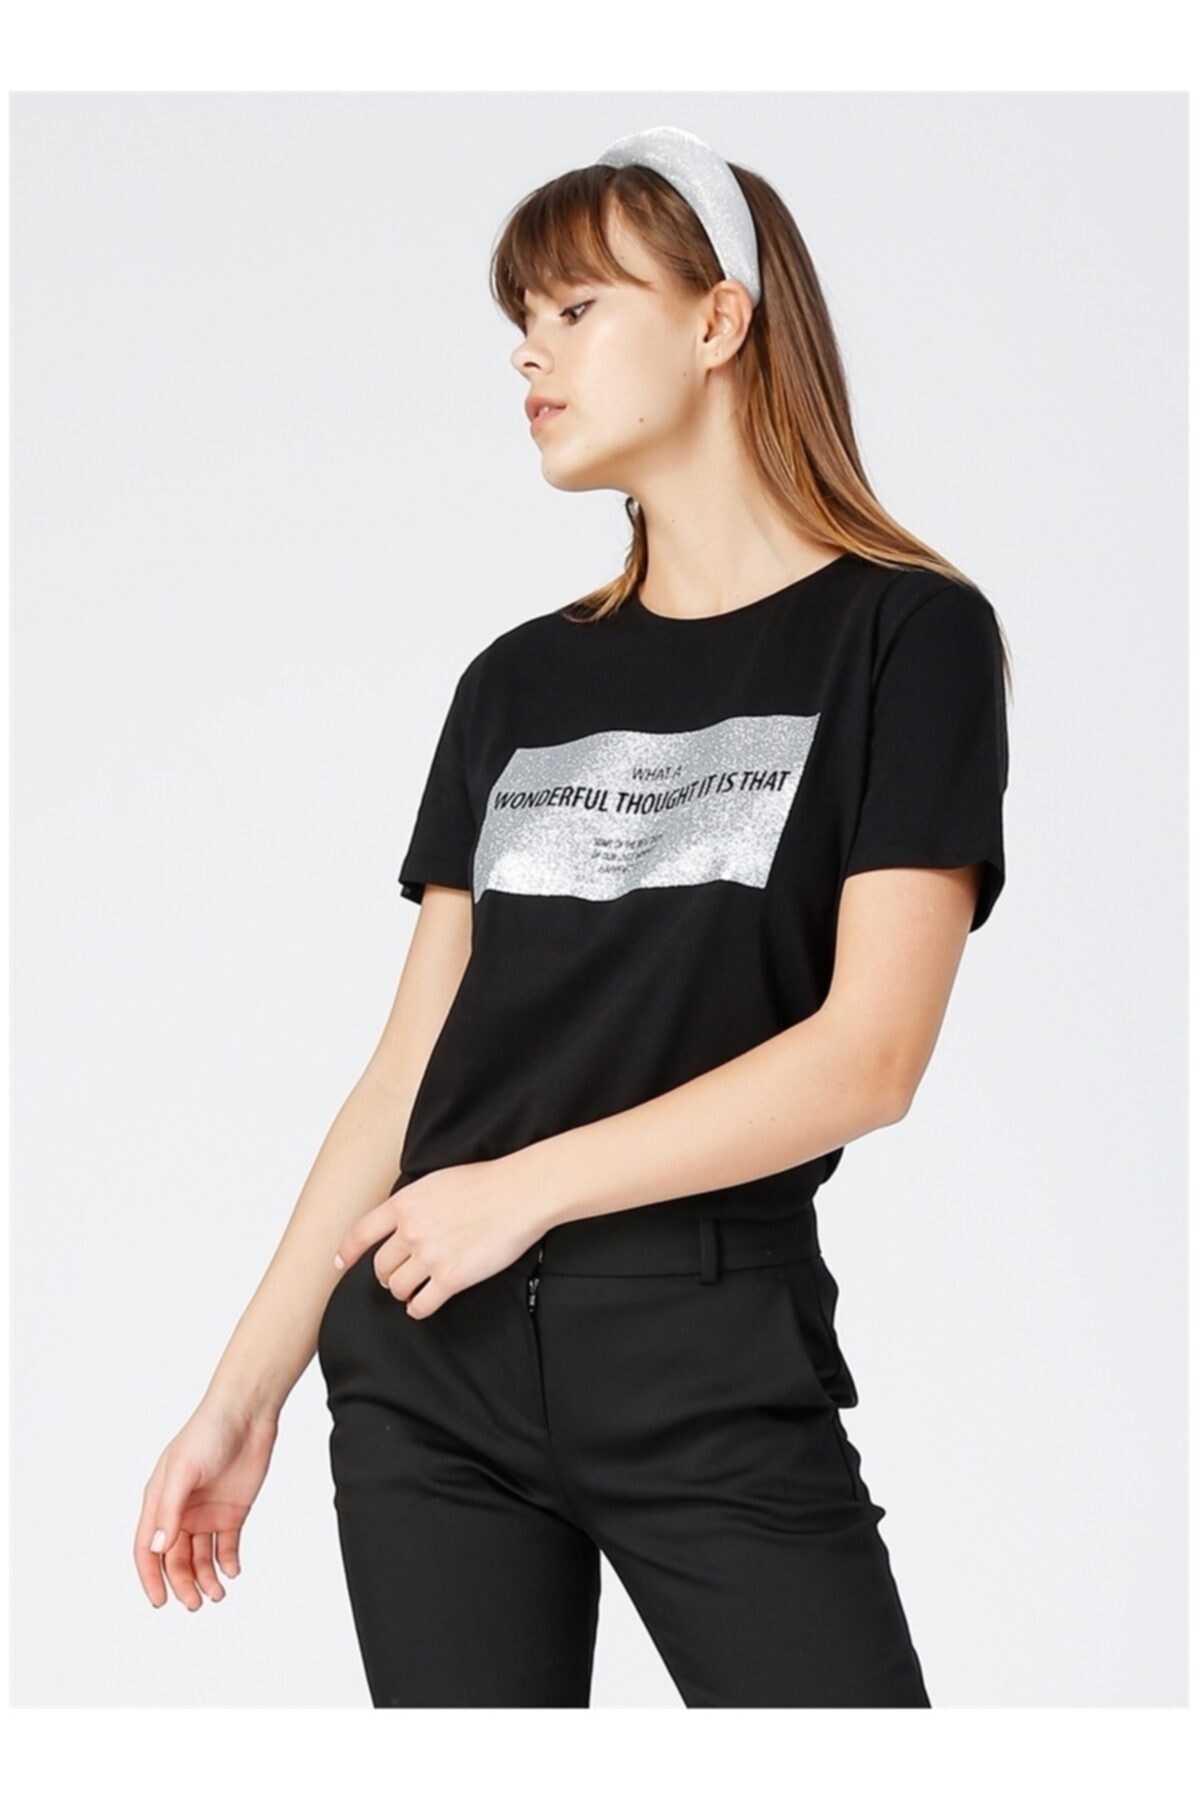 Kadın Siyah Kısa Kol T-Shirt